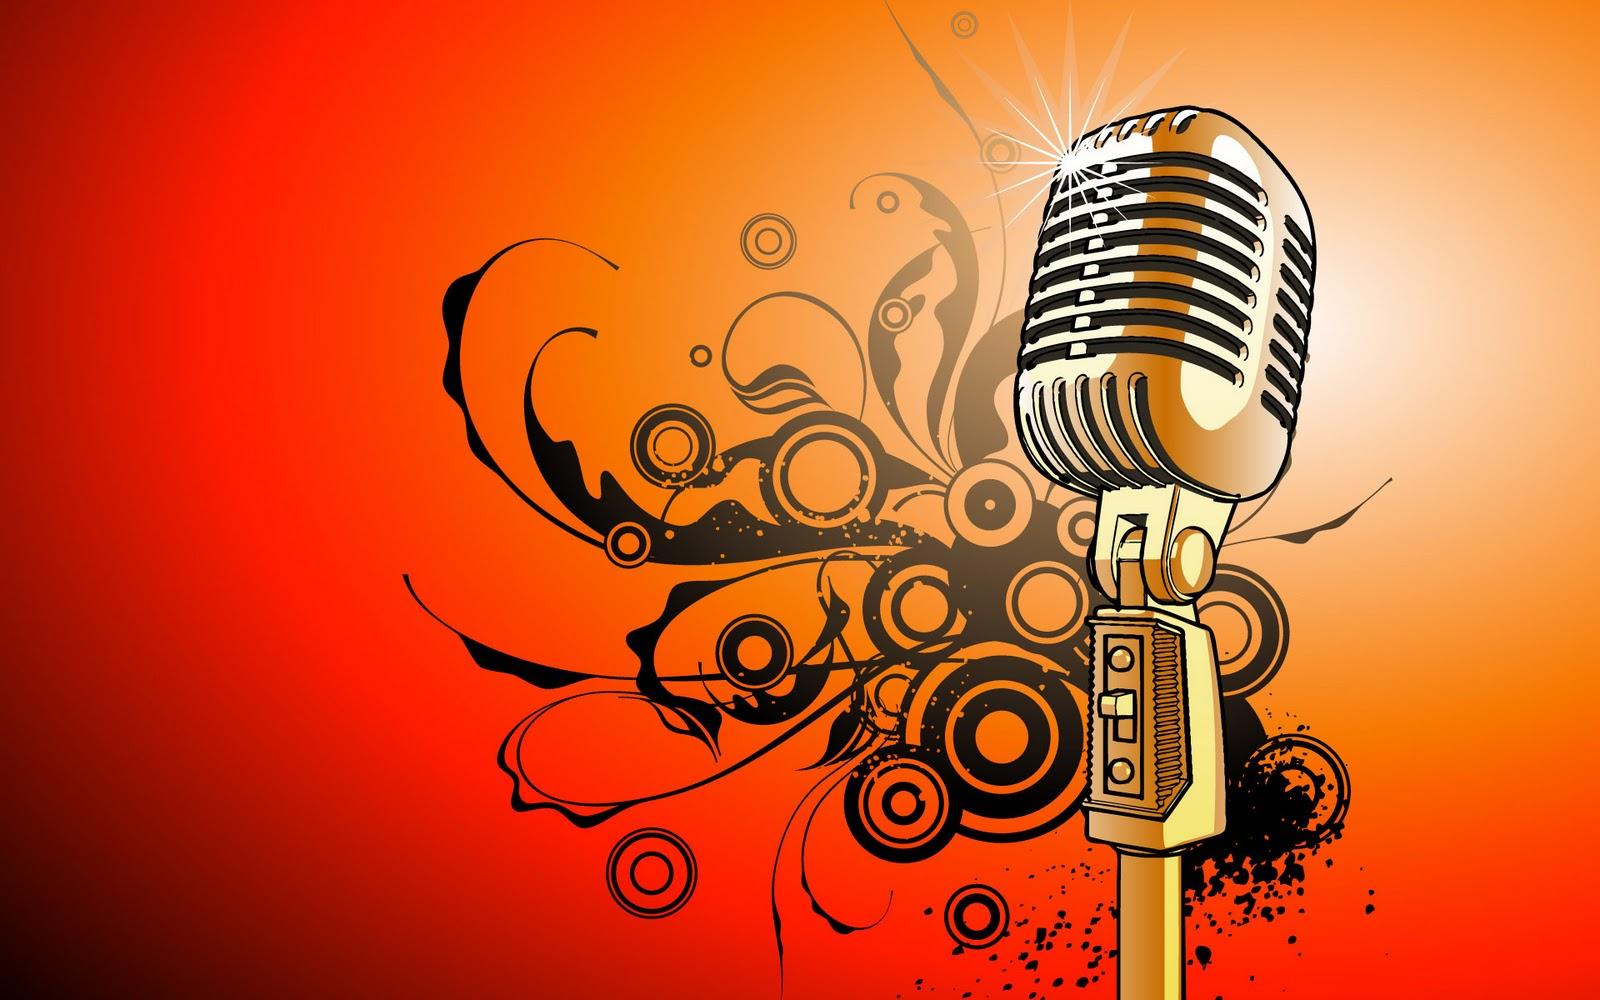 Love Music Wallpaper For Desktop Wallpaper Music Photo Shared By 1600x1000